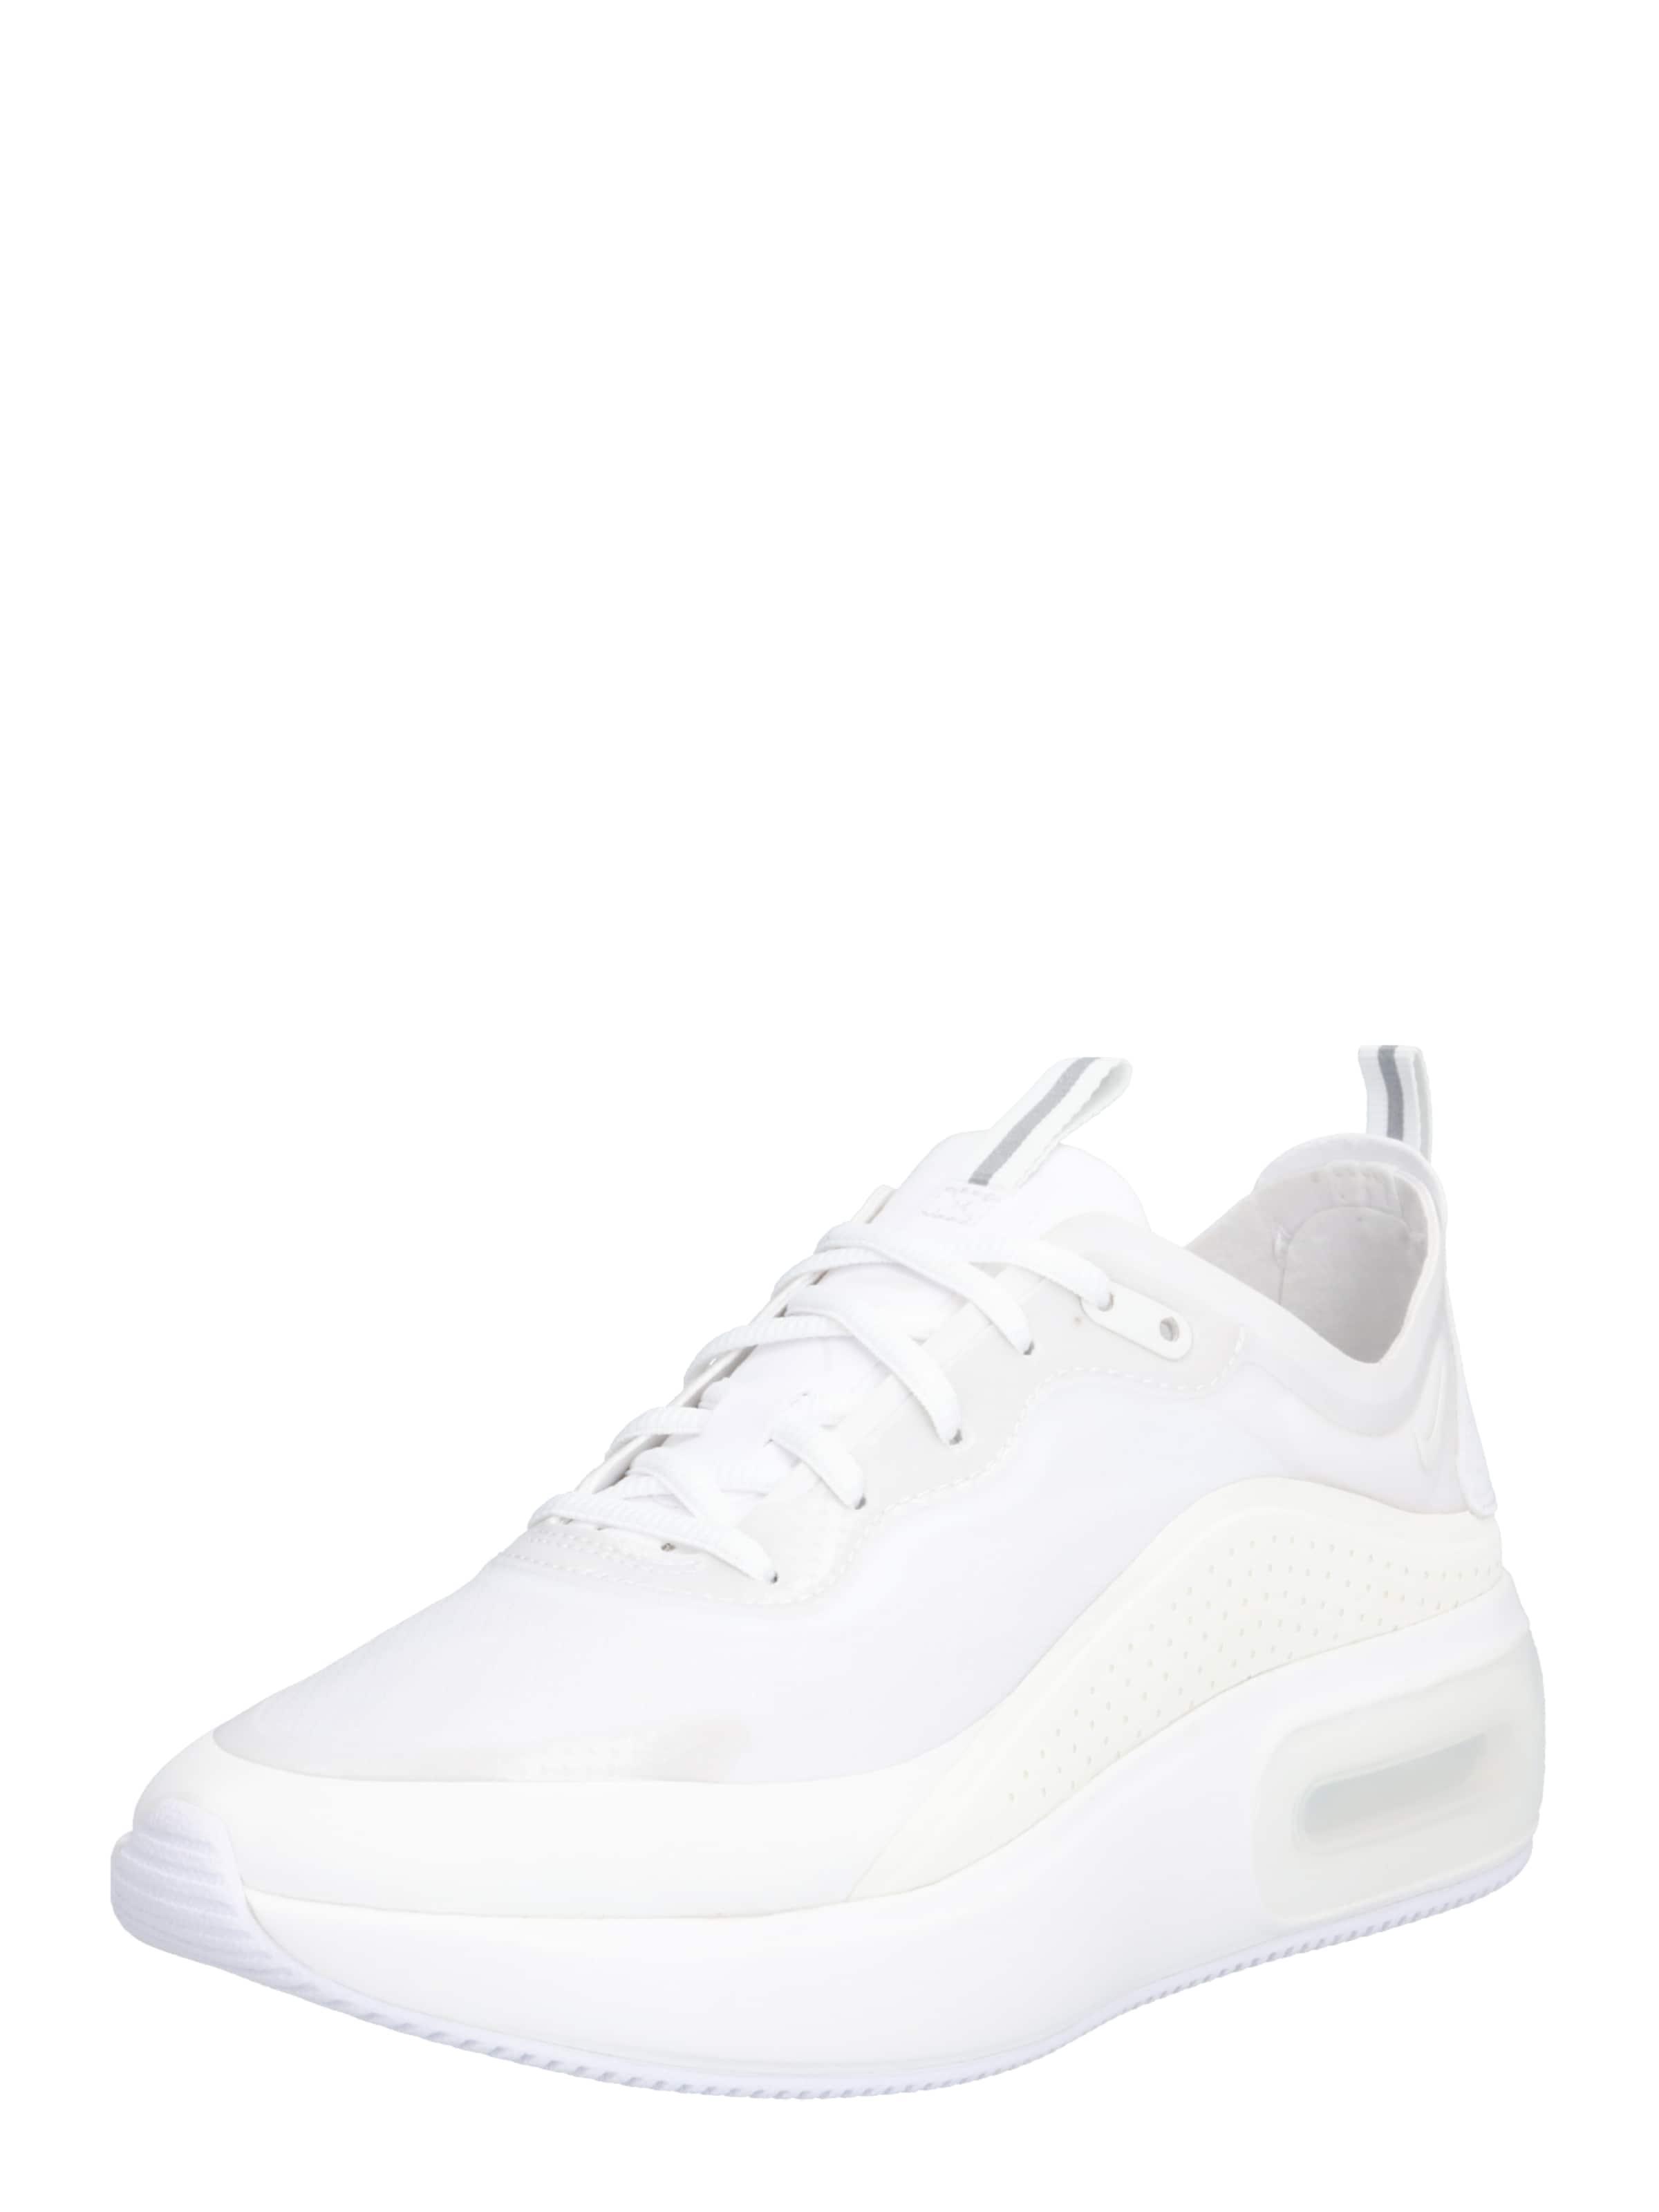 GelbOrangerot Sneaker Max In Nike Weiß Sportswear Air Se' 'nike Dia HDW9Y2EI